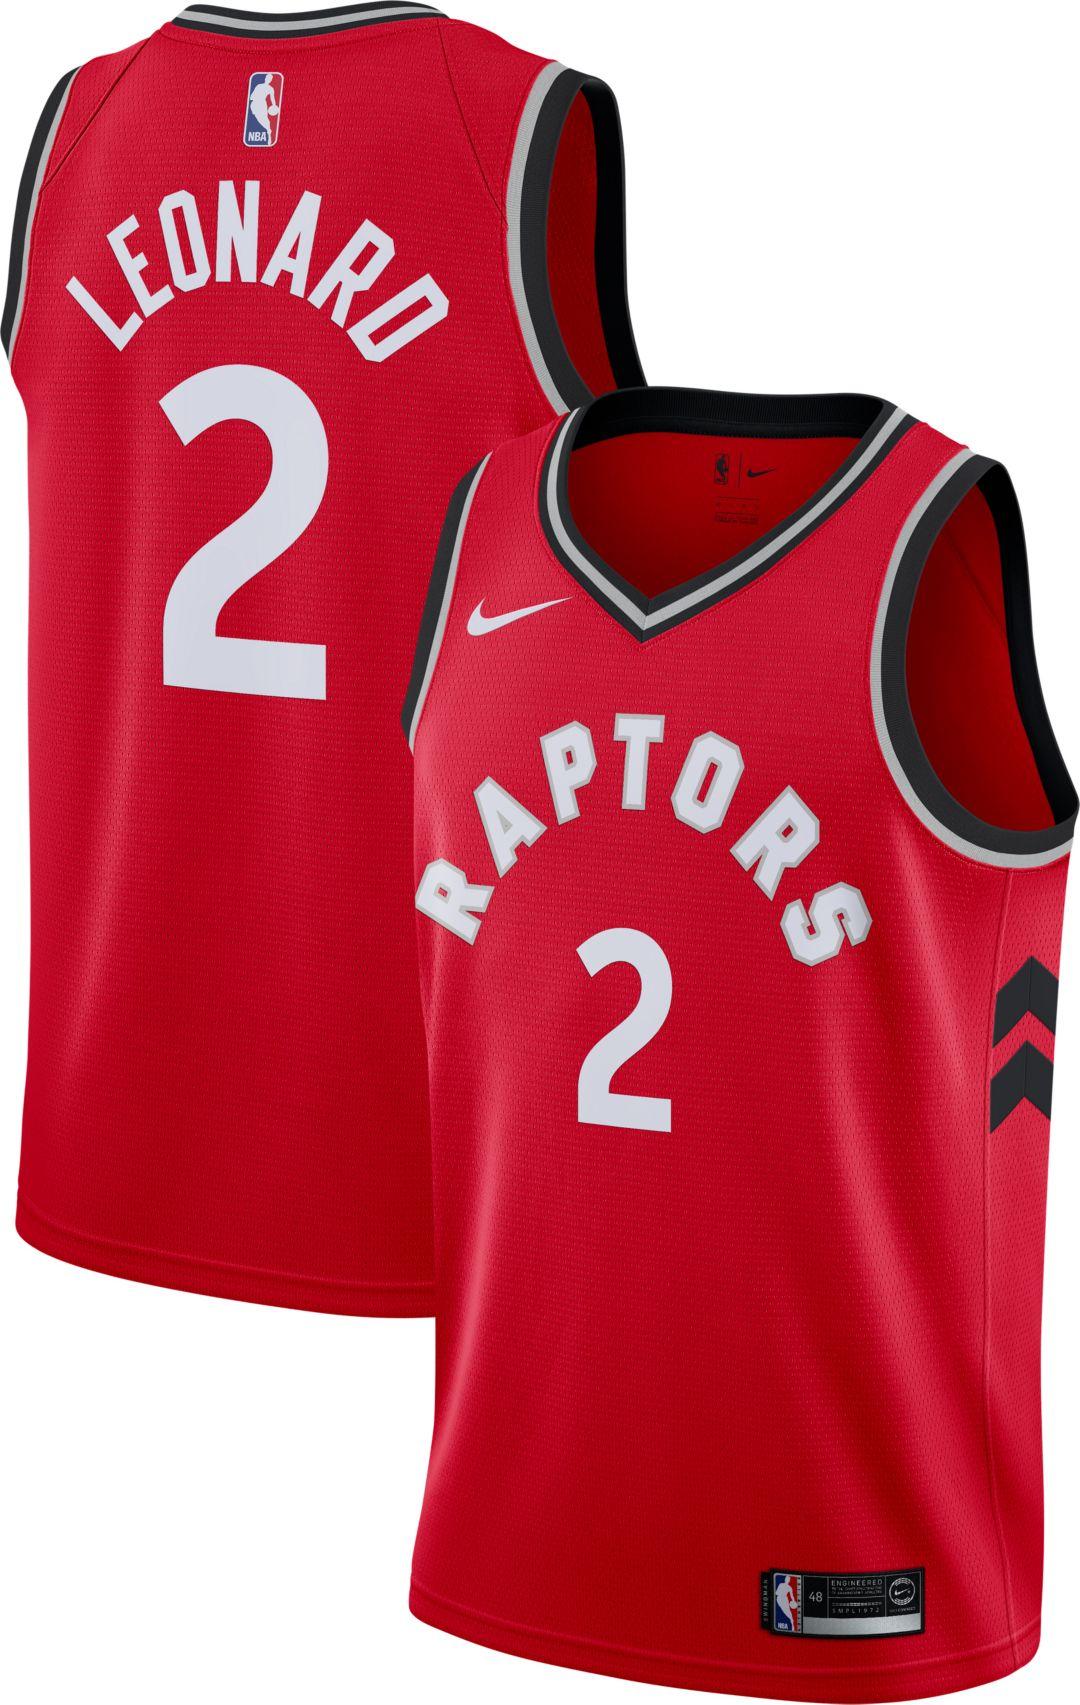 9cd57755889a Nike Men s Toronto Raptors Kawhi Leonard  2 Red Dri-FIT Swingman Jersey 1